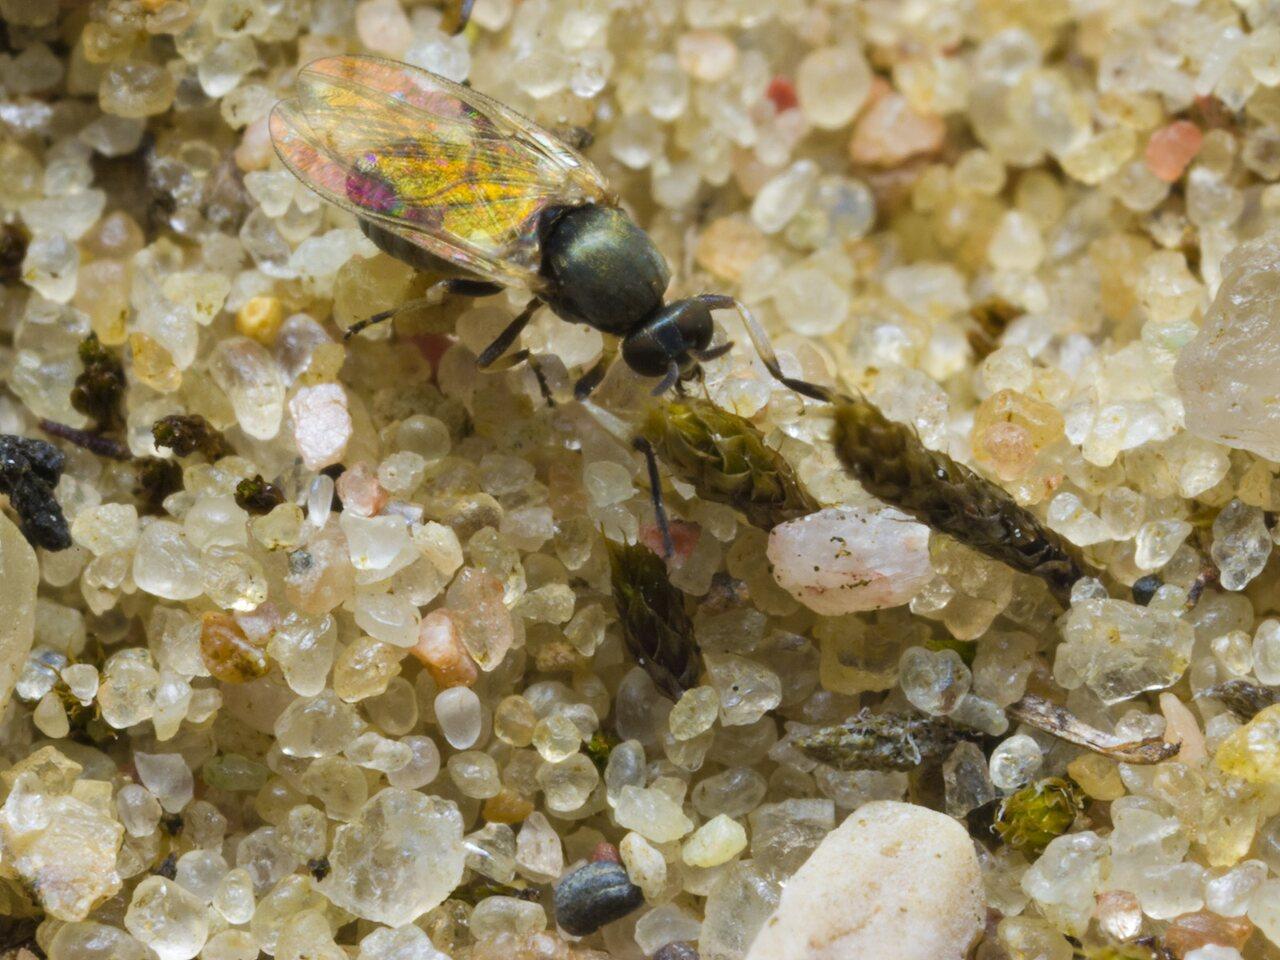 Diptera-0686.jpg